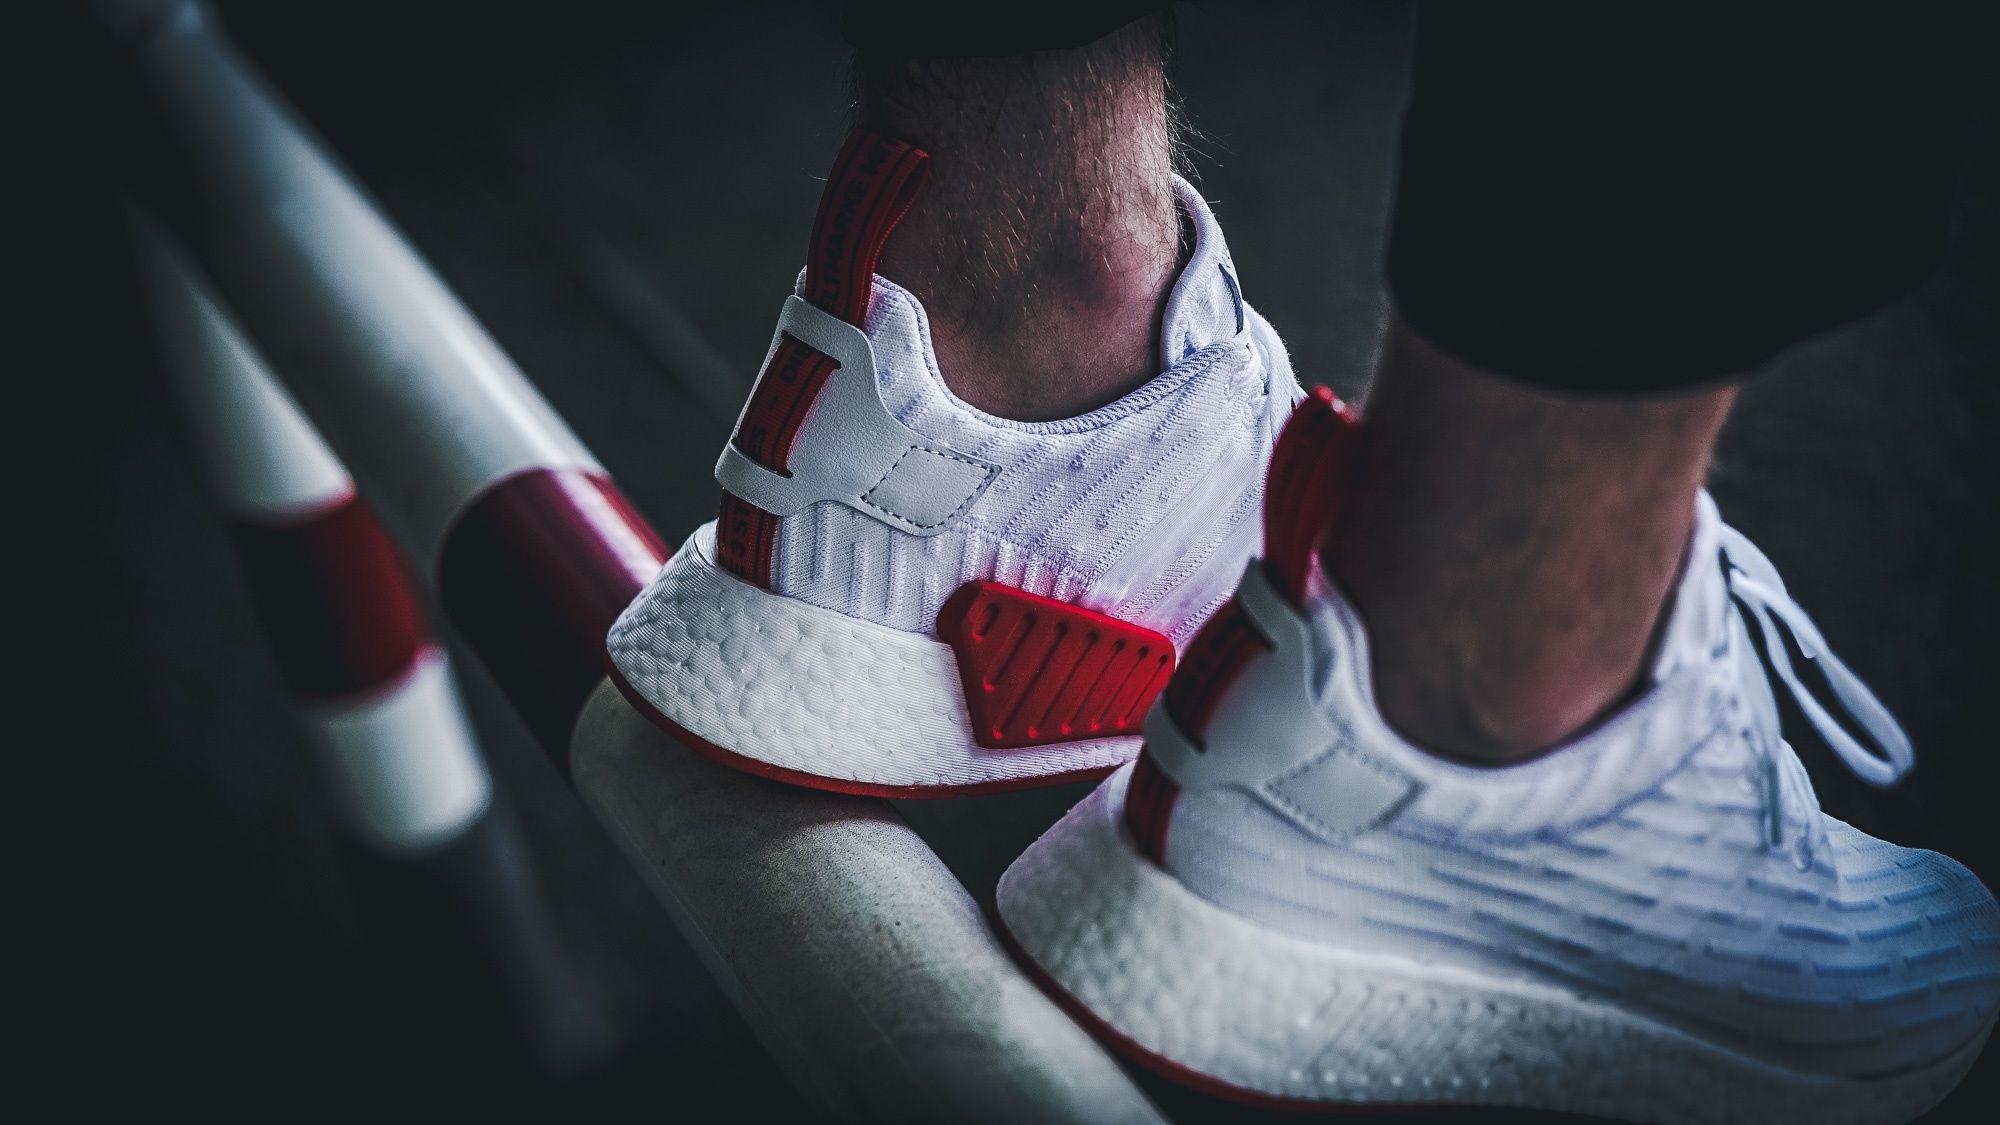 adidas-nmd_r2-pk-white-red-ba7253-mood-2